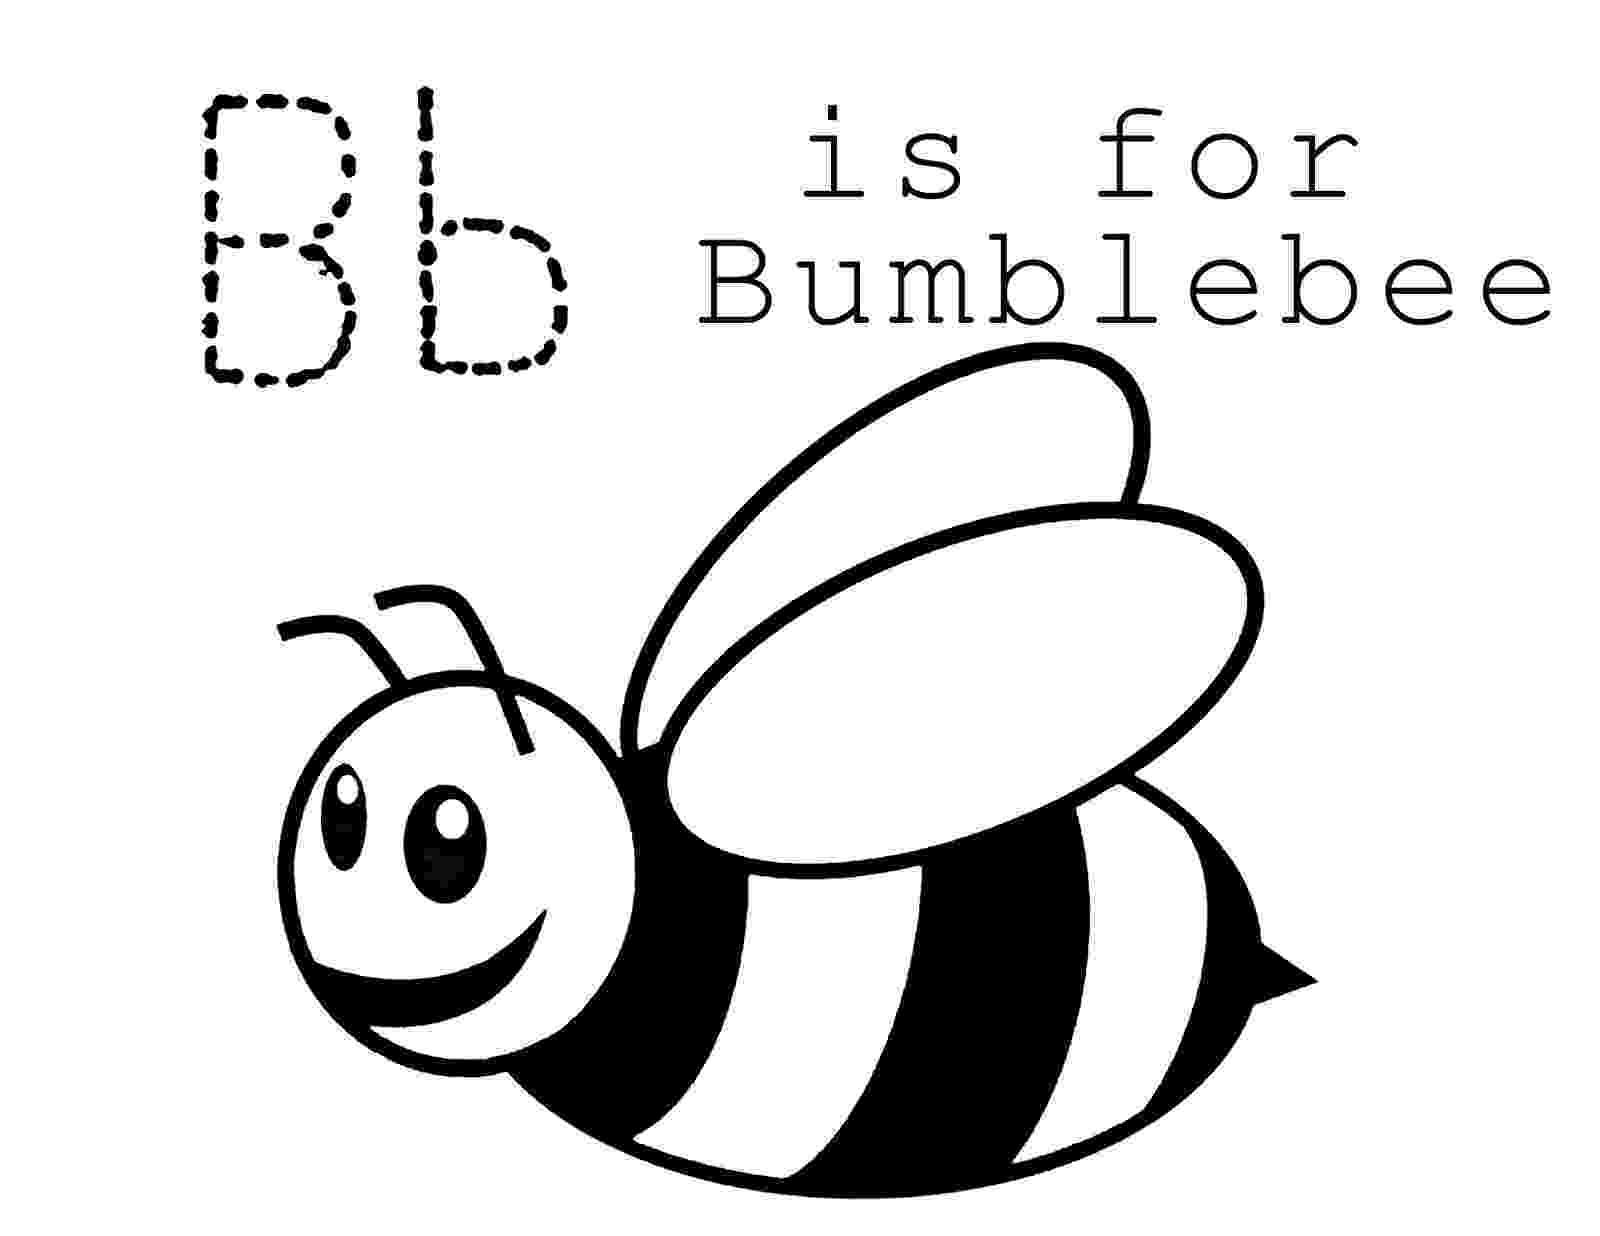 bee coloring sheet free printable bumble bee coloring pages for kids bee coloring sheet 1 1